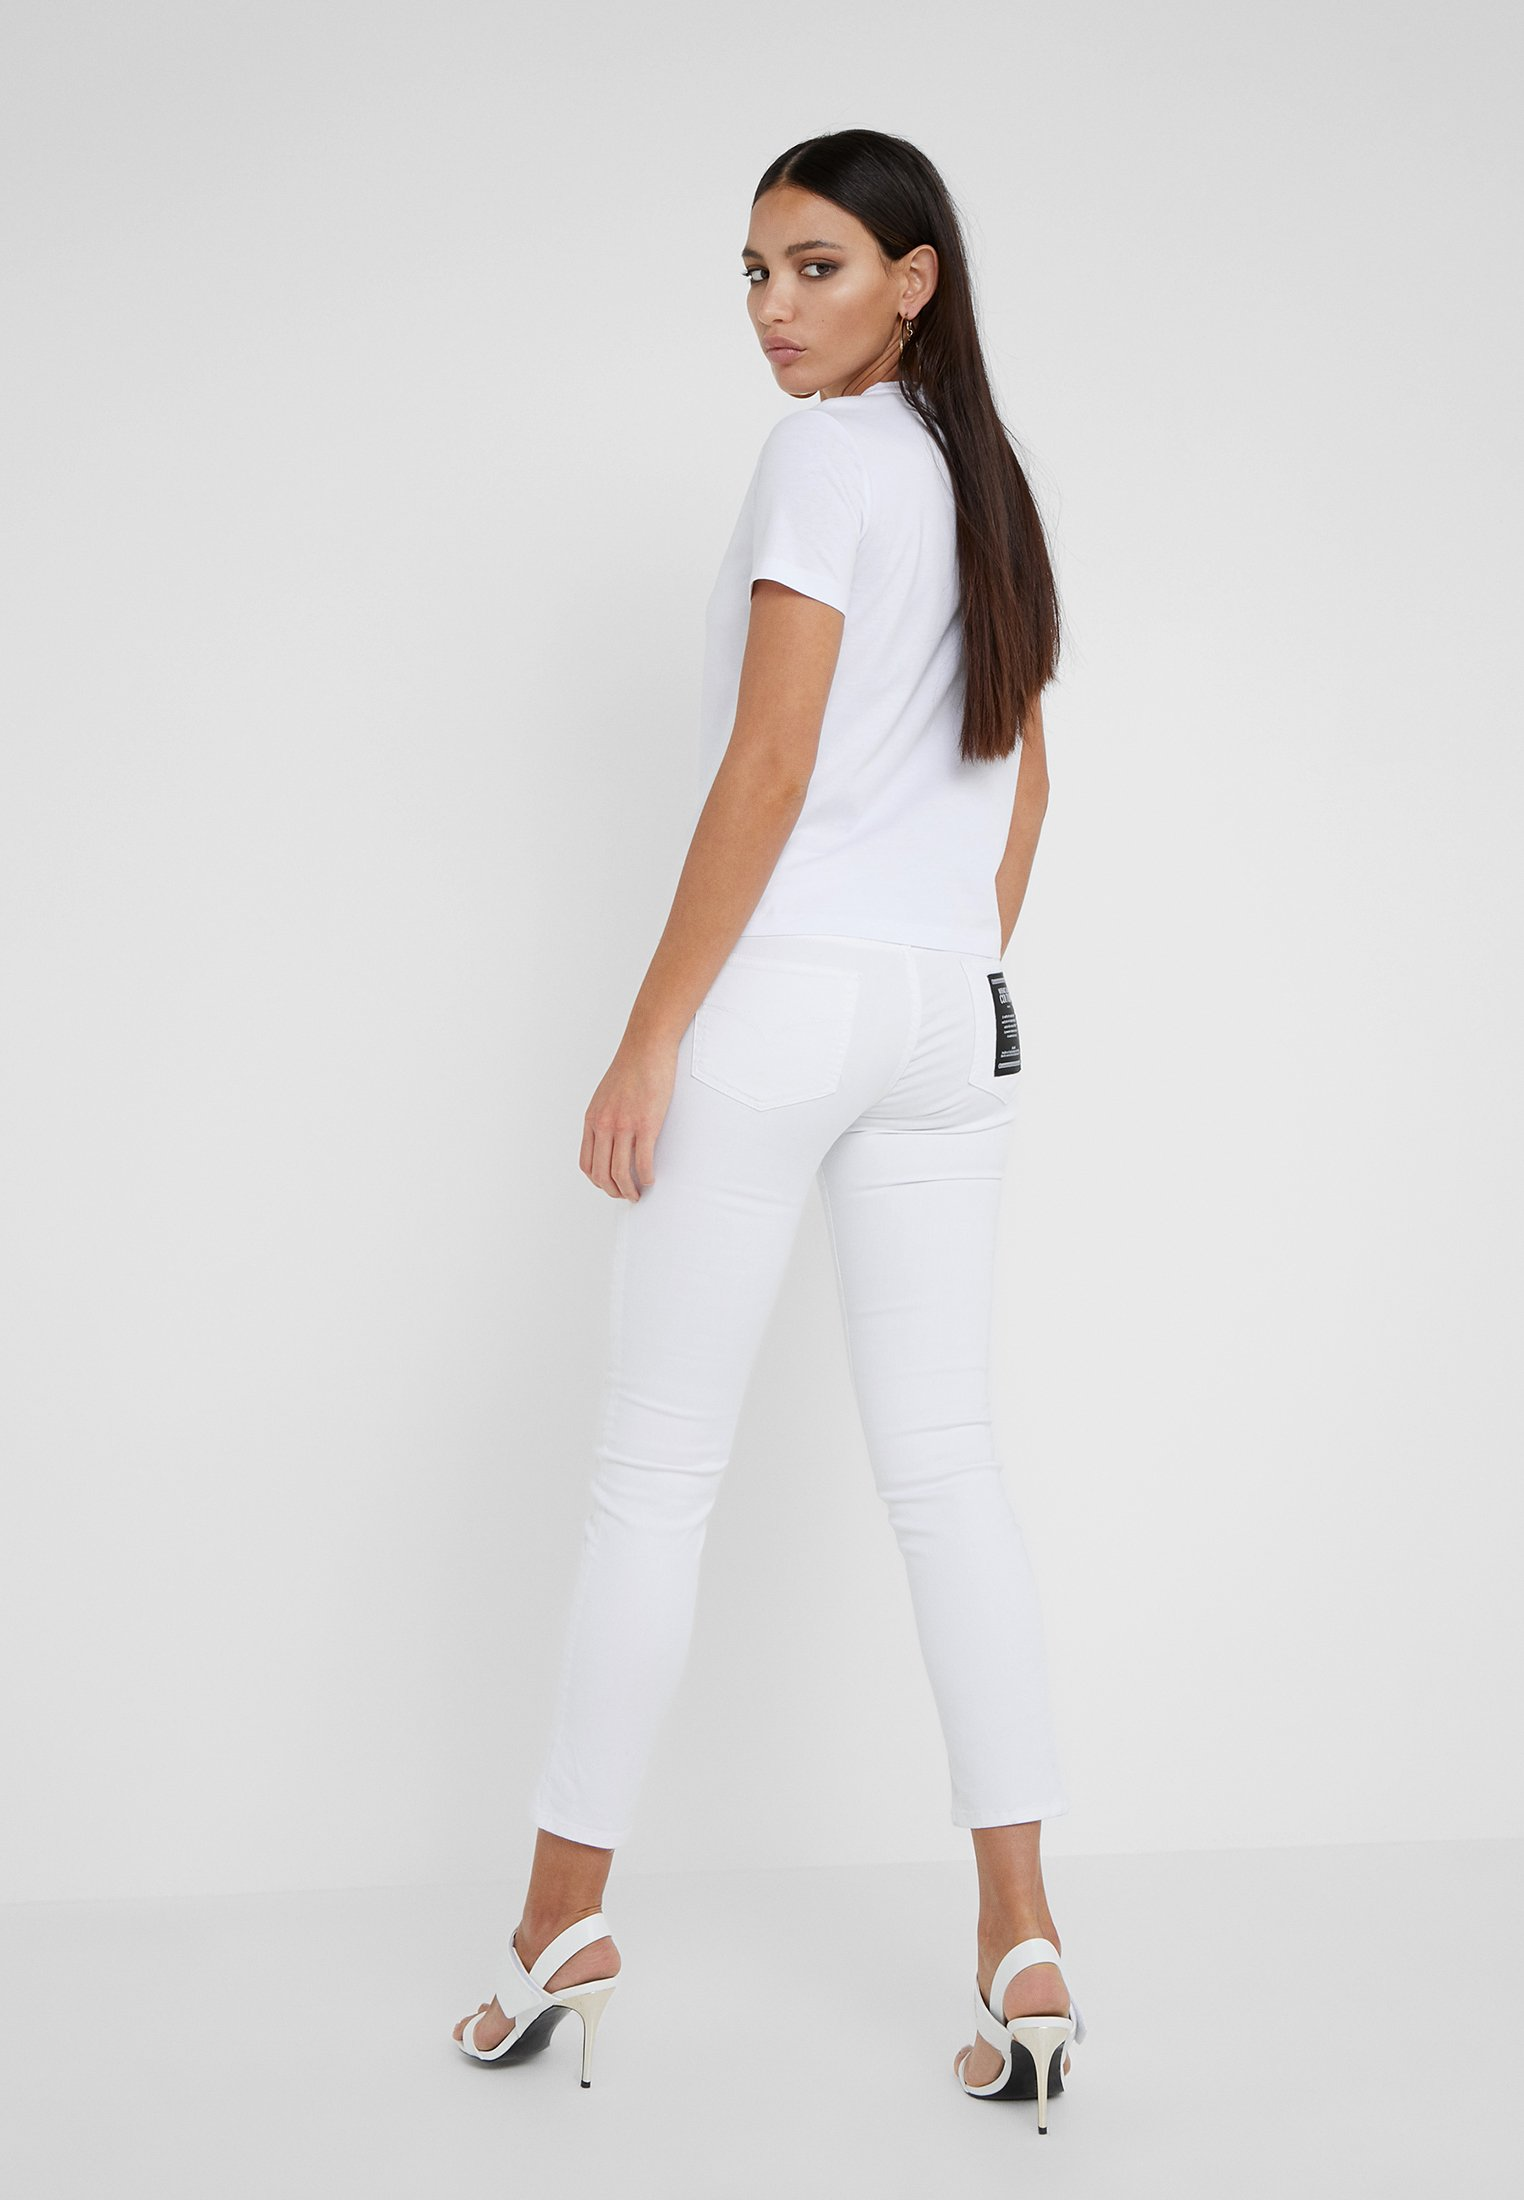 SkinnyBianco Jeans Versace Couture Ottico 35R4AqjL